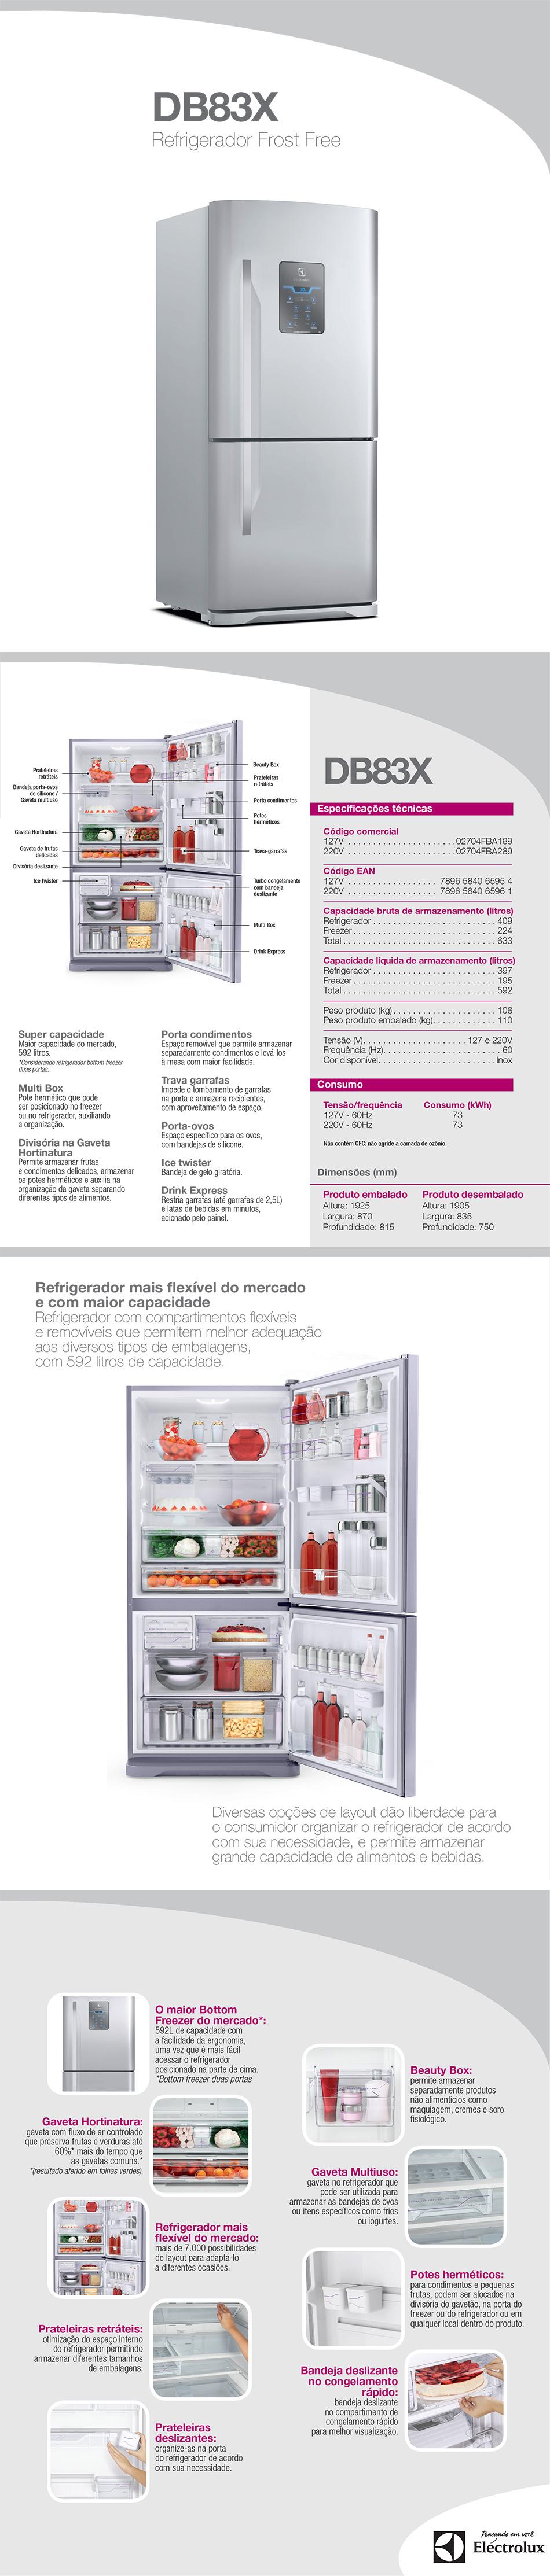 Geladeira electrolux 598 litros inox